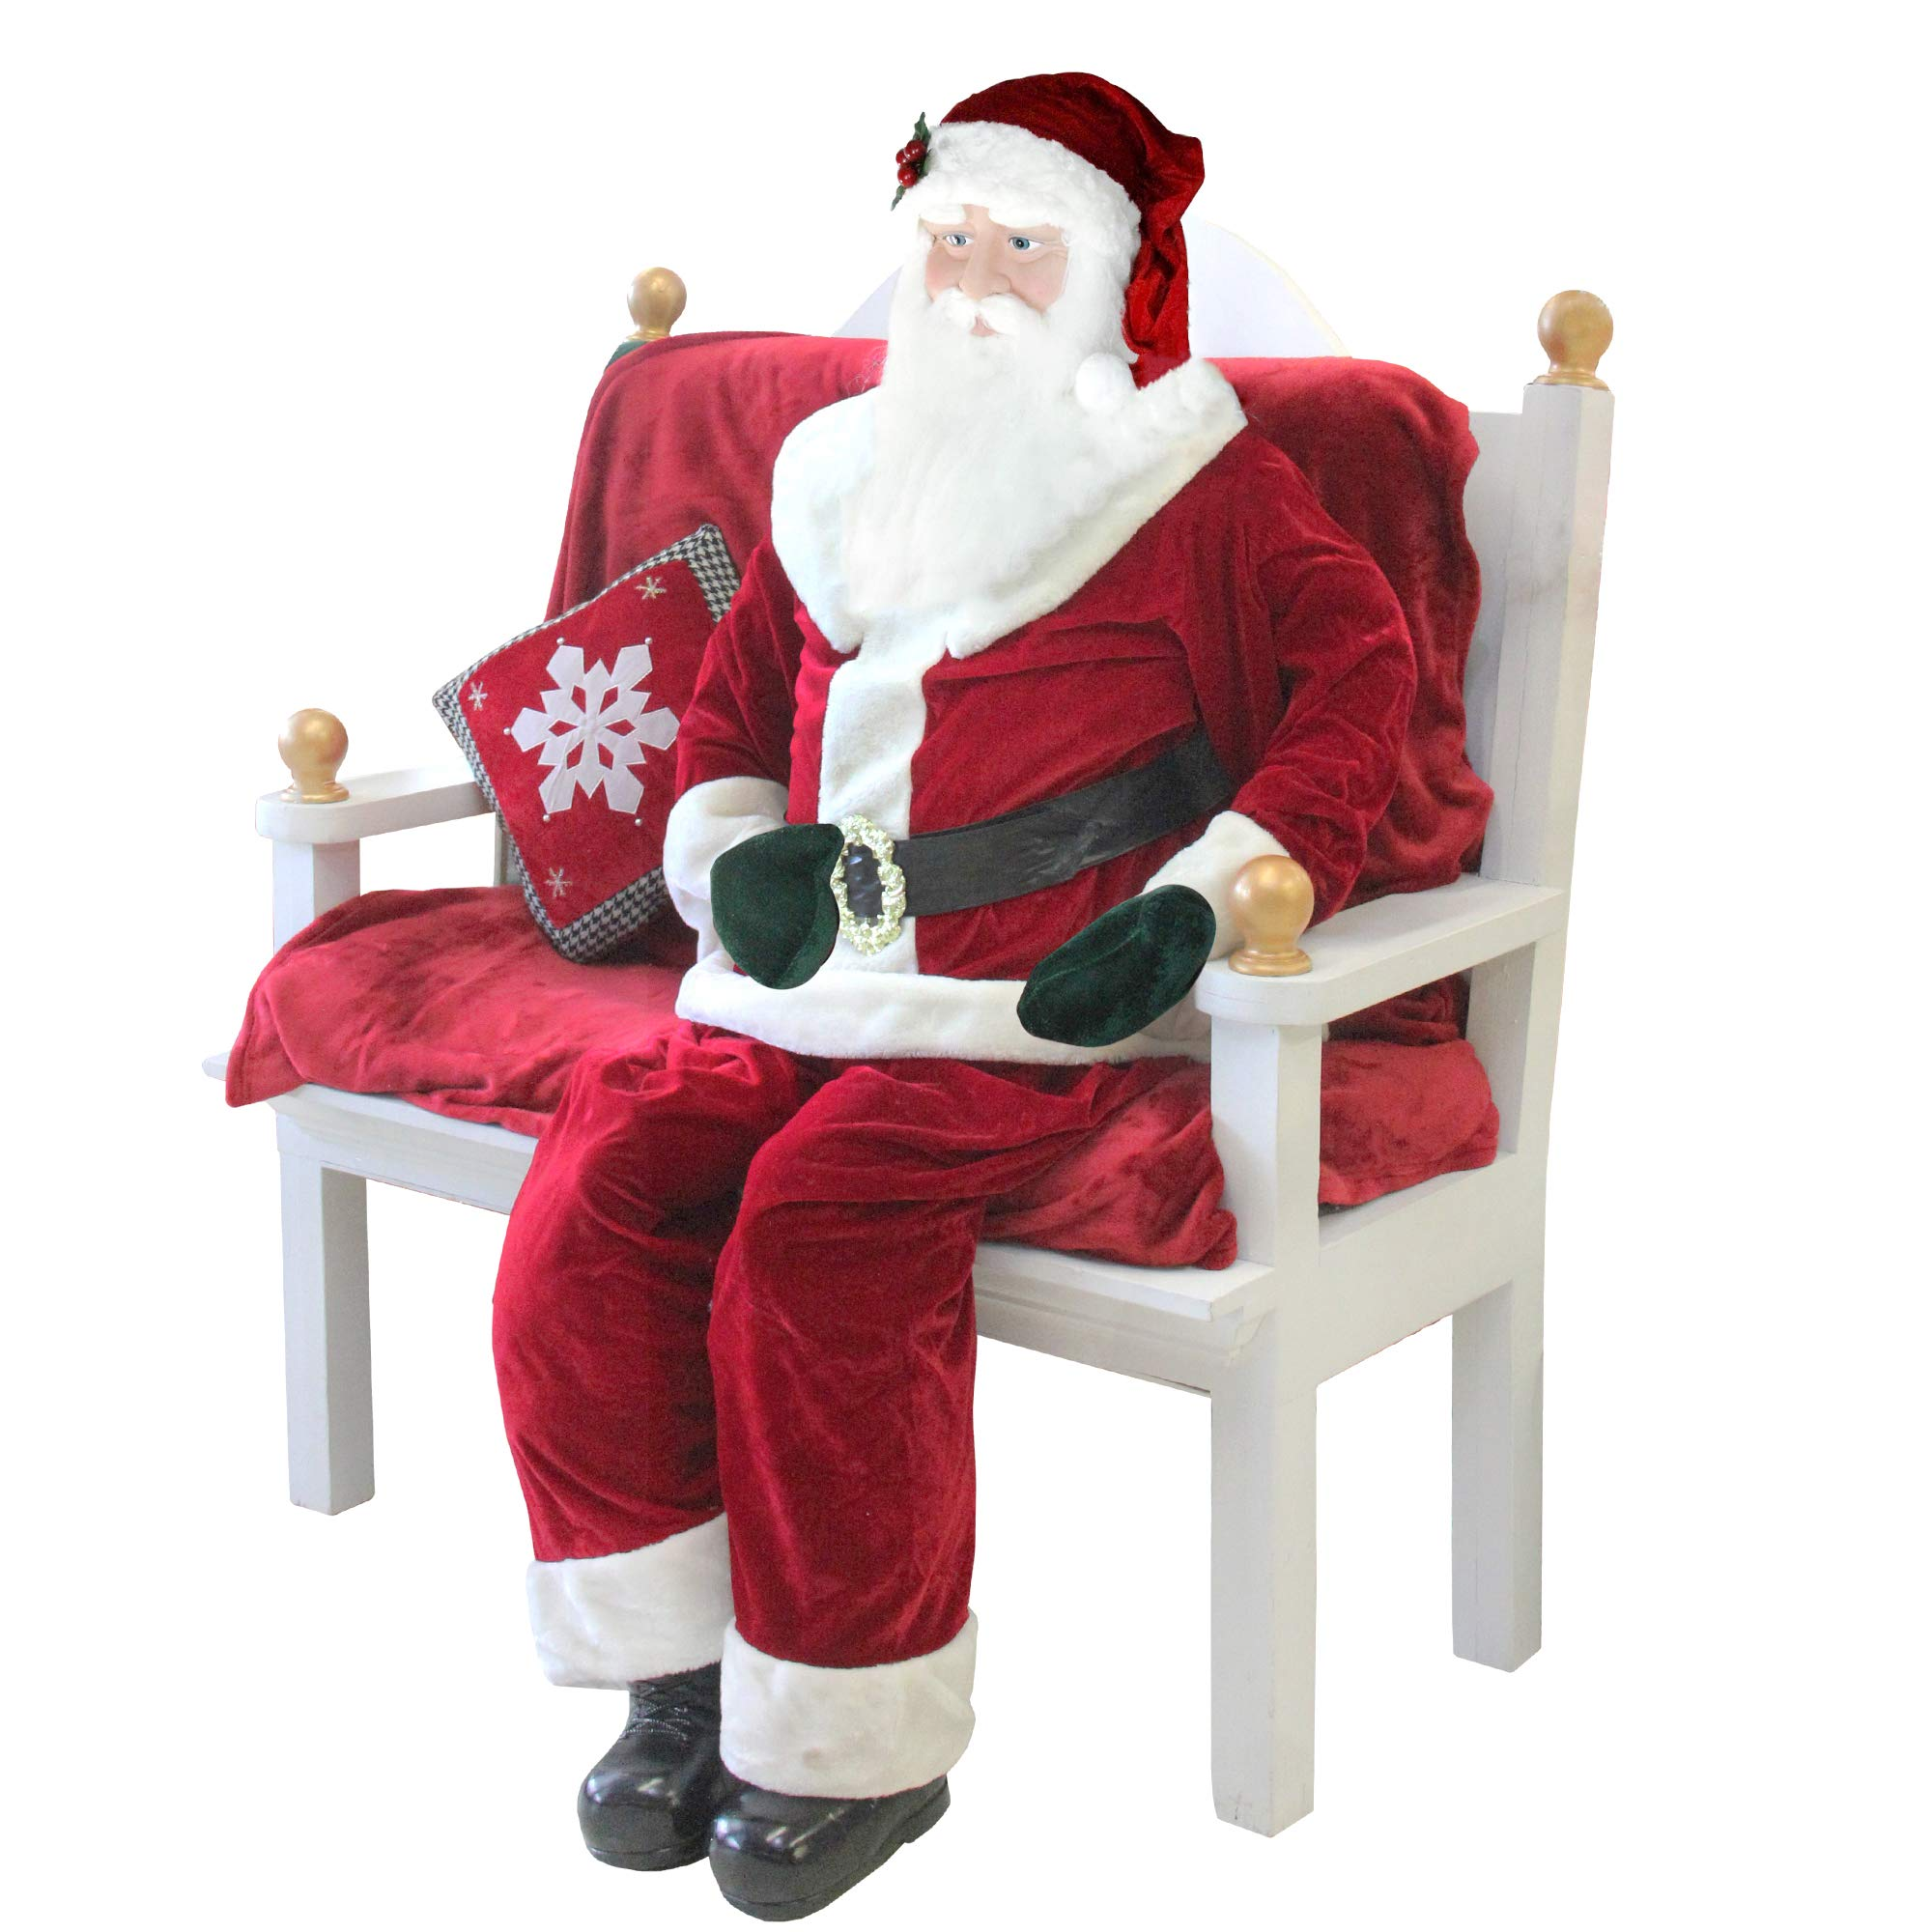 Northlight Huge 6 Foot Life-Size Decorative Plush Standing Santa Claus